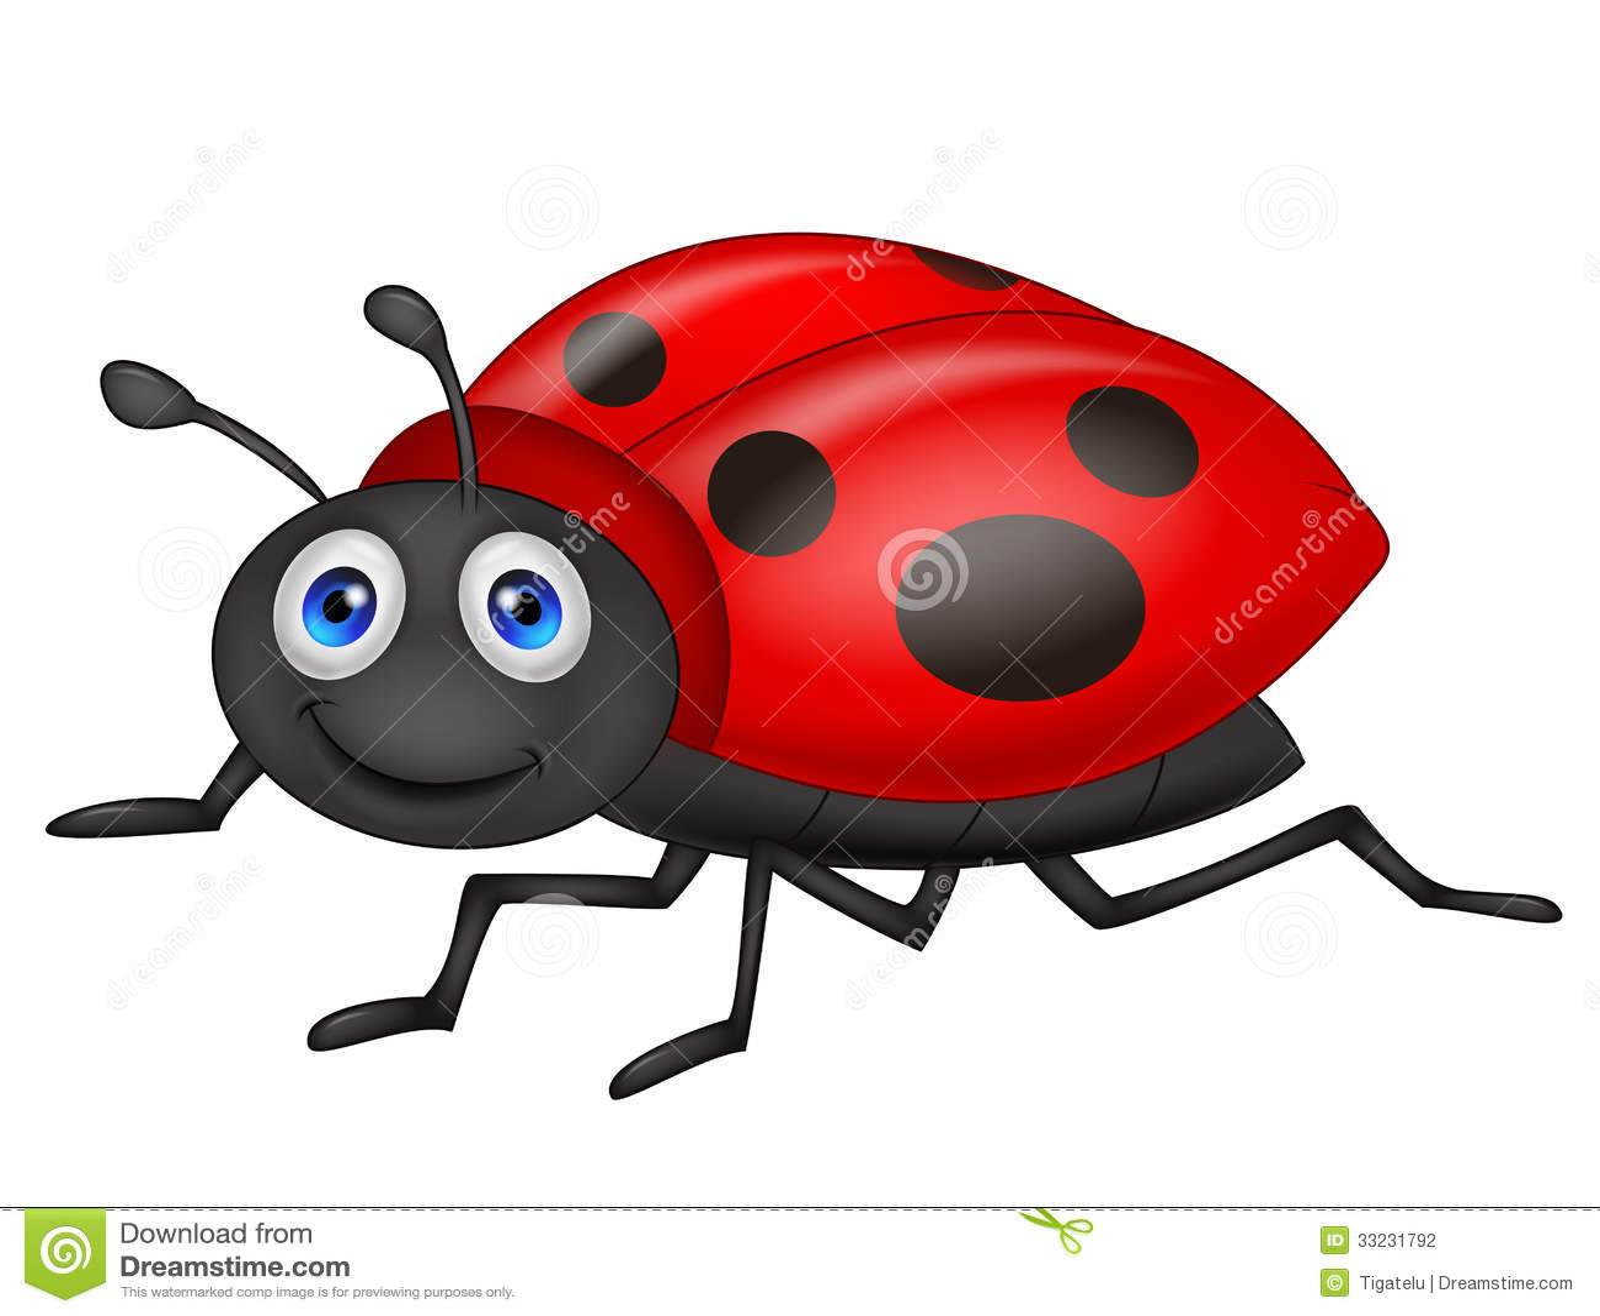 Cute Ladybug Cartoon Stock Photography - Image: 33231792